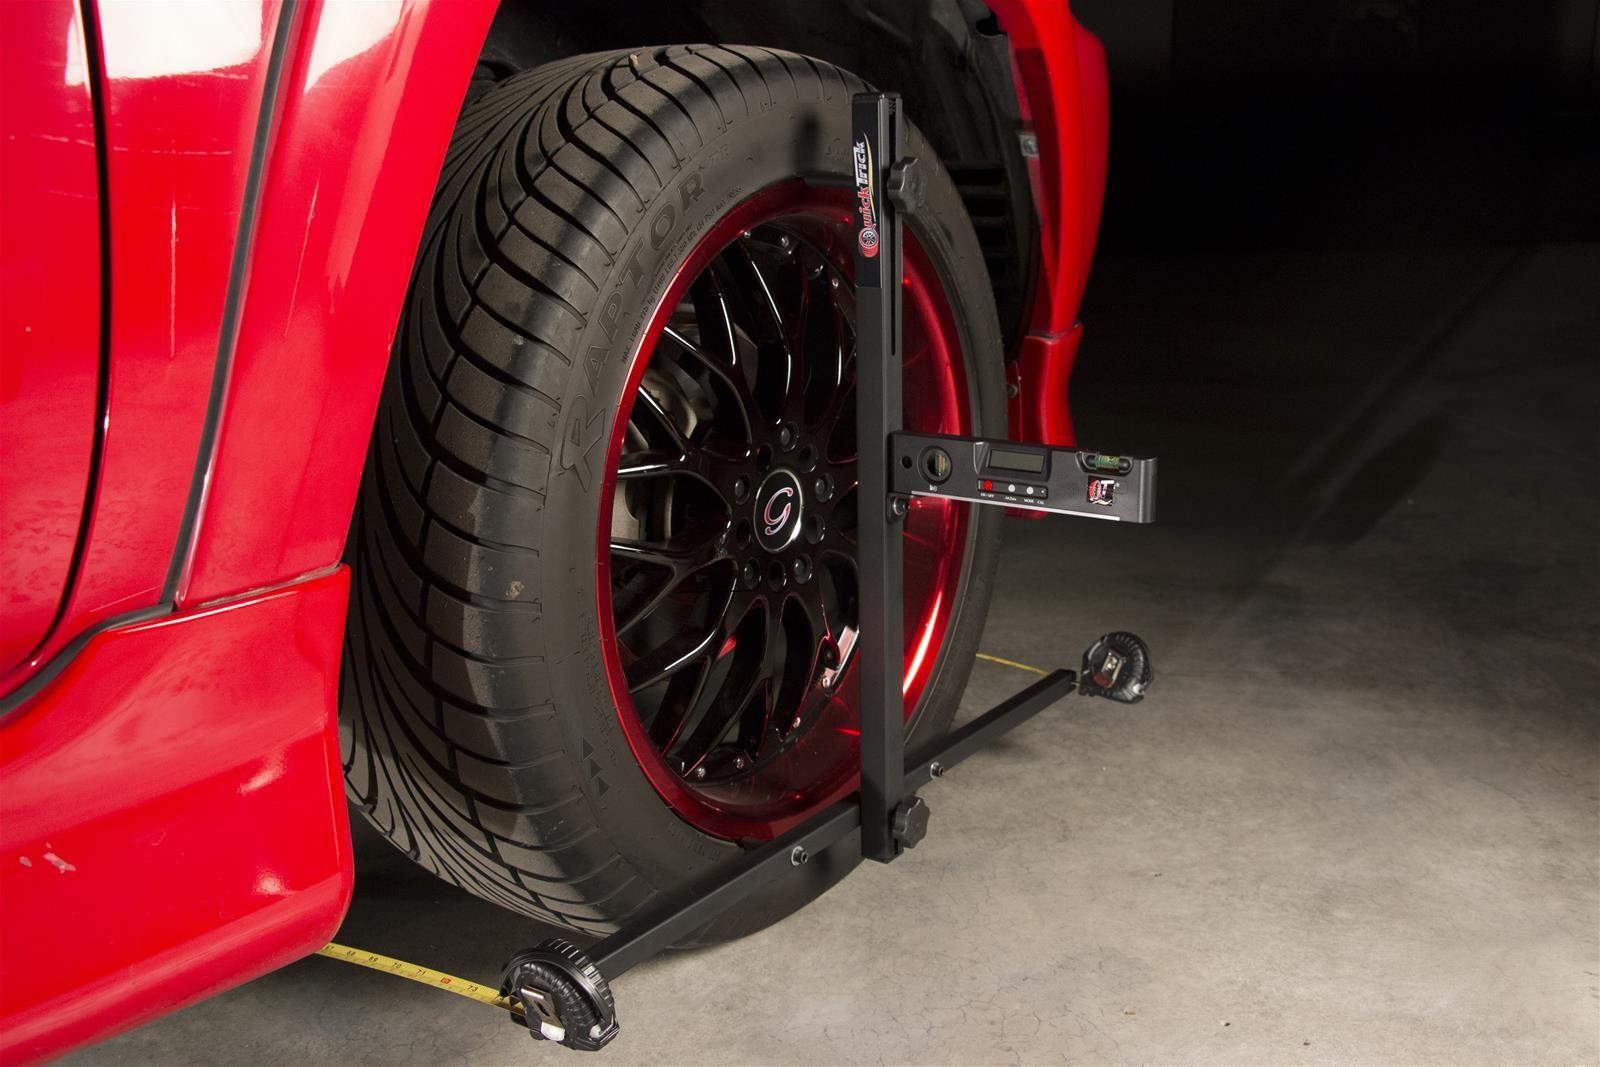 Quick Trick Alignment Pro System Wheel Alignment Tools